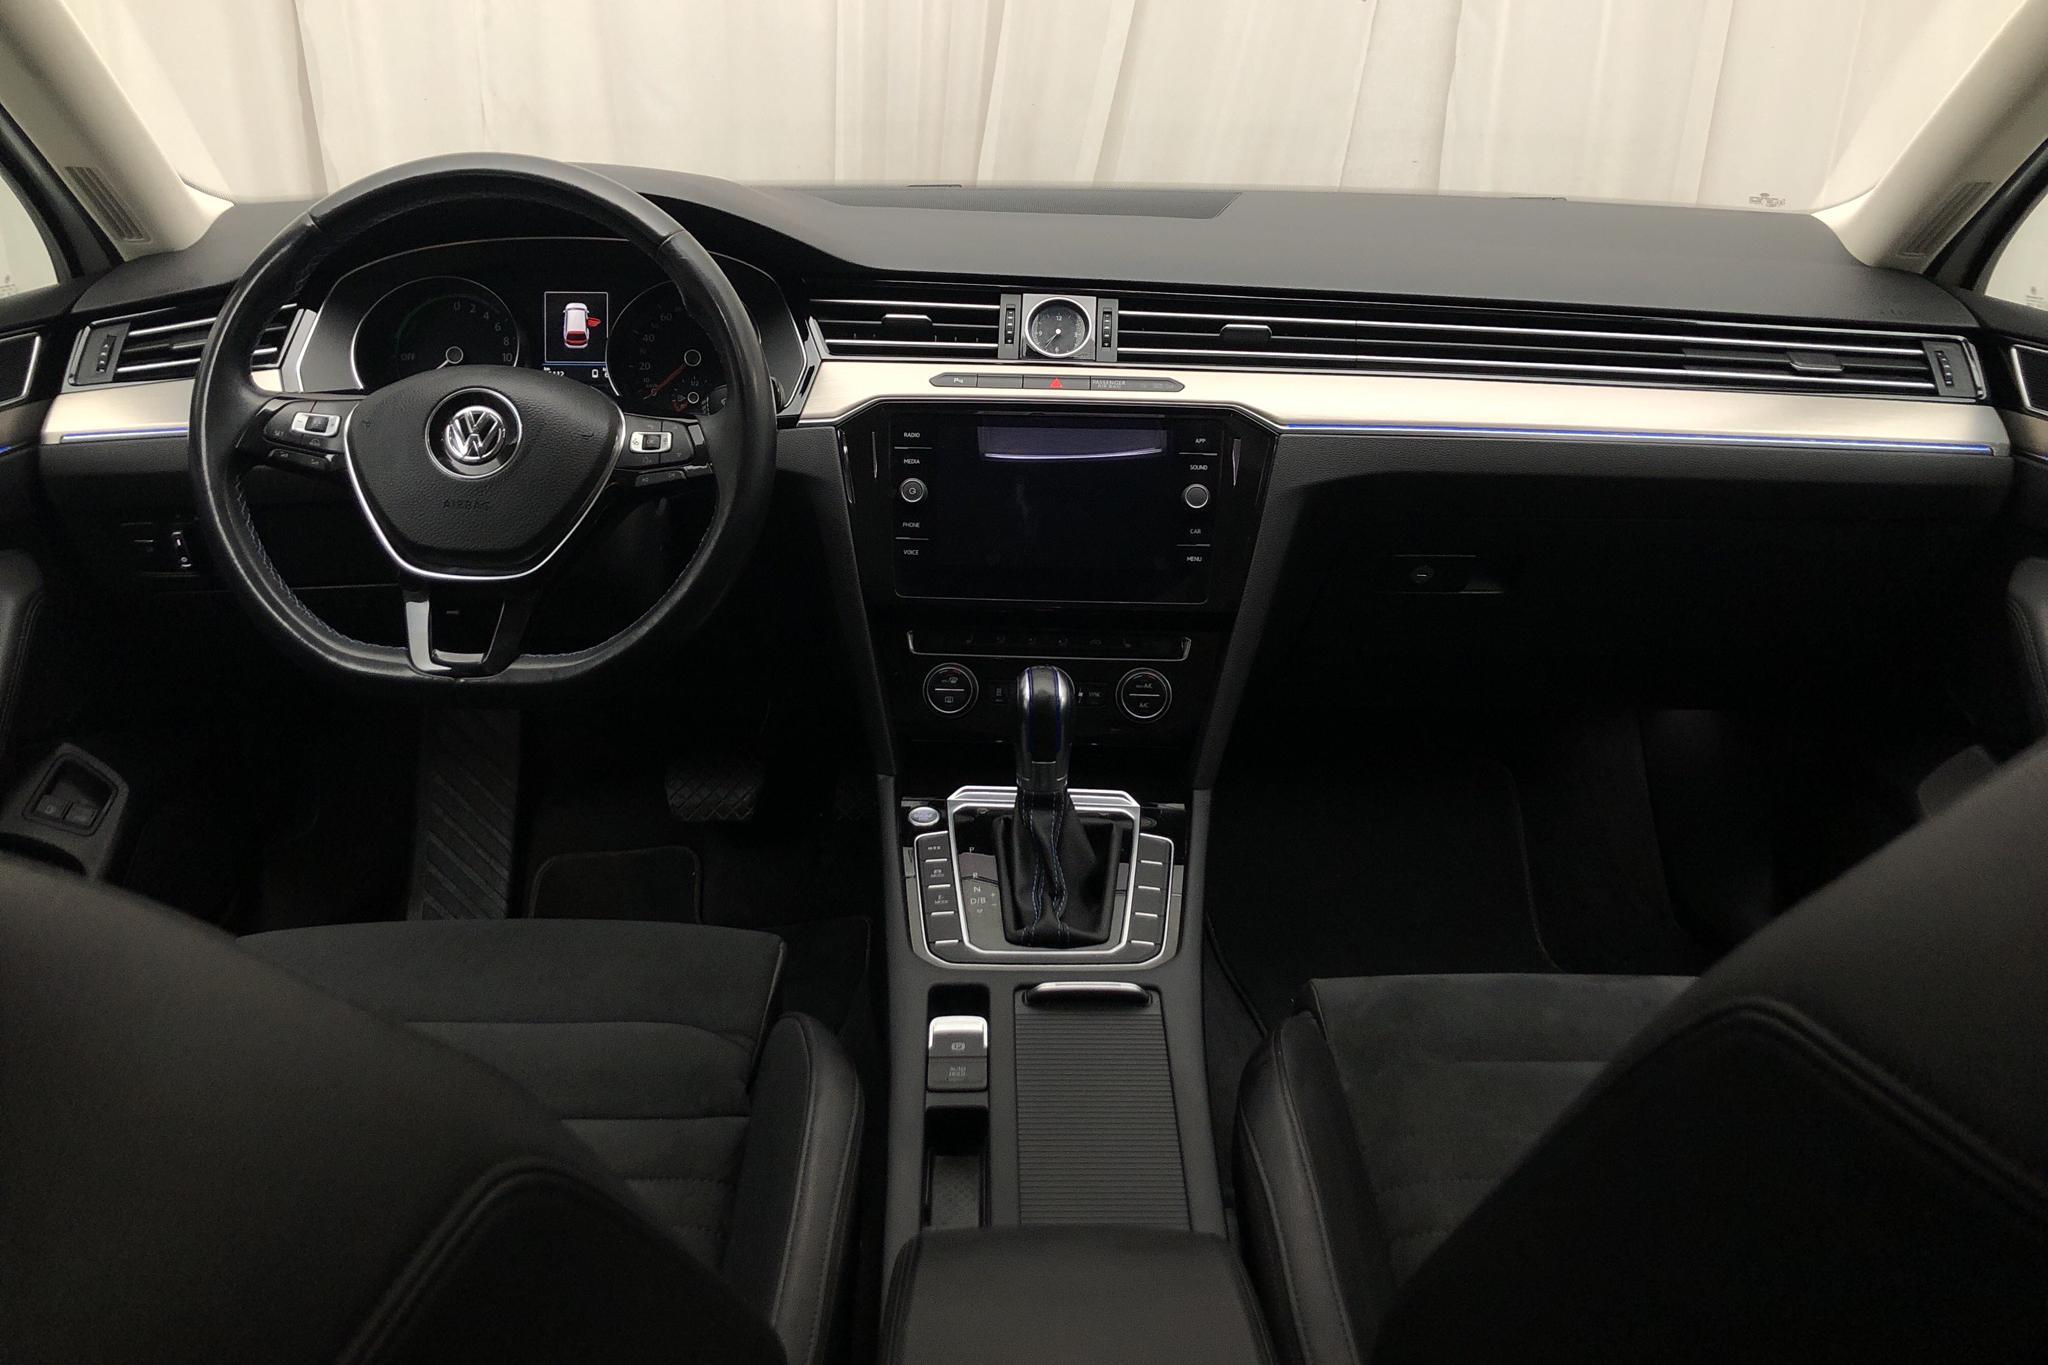 VW Passat 1.4 Plug-in-Hybrid Sportscombi (218hk) - 96 110 km - Automatic - white - 2018